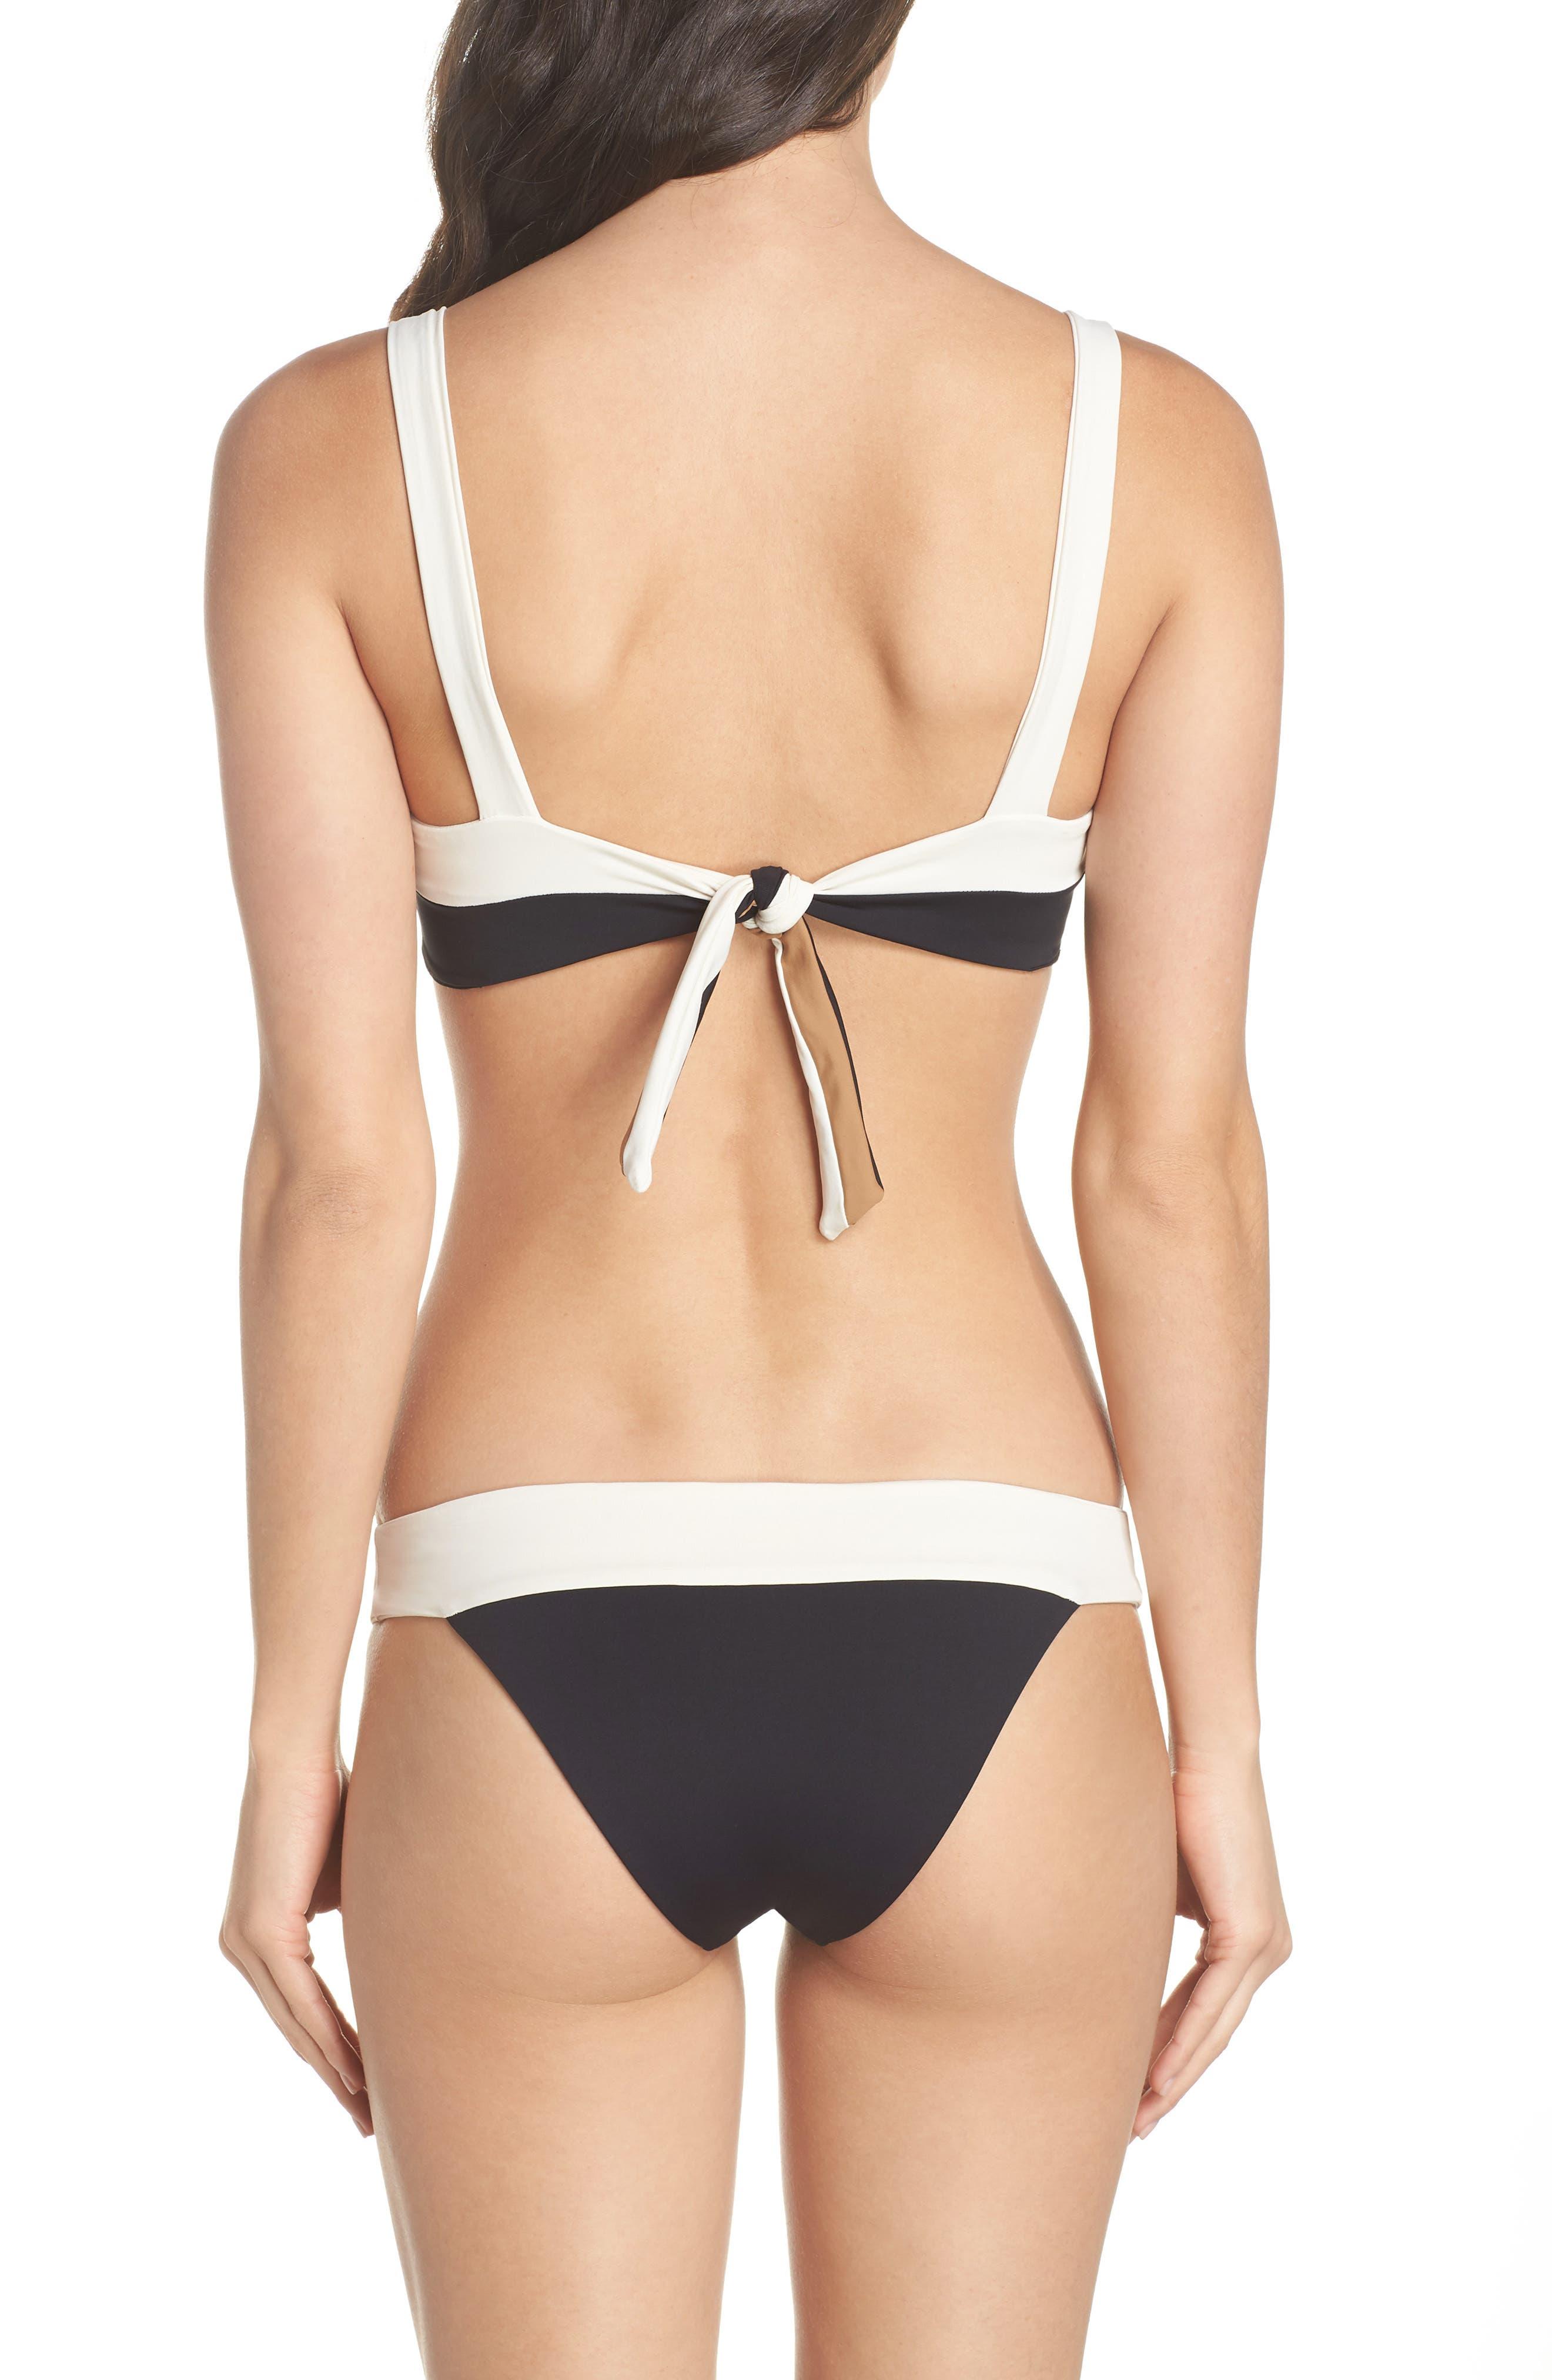 Reversible Bikini Bottom,                             Alternate thumbnail 8, color,                             CREAM/ BLACK/ CAMEL